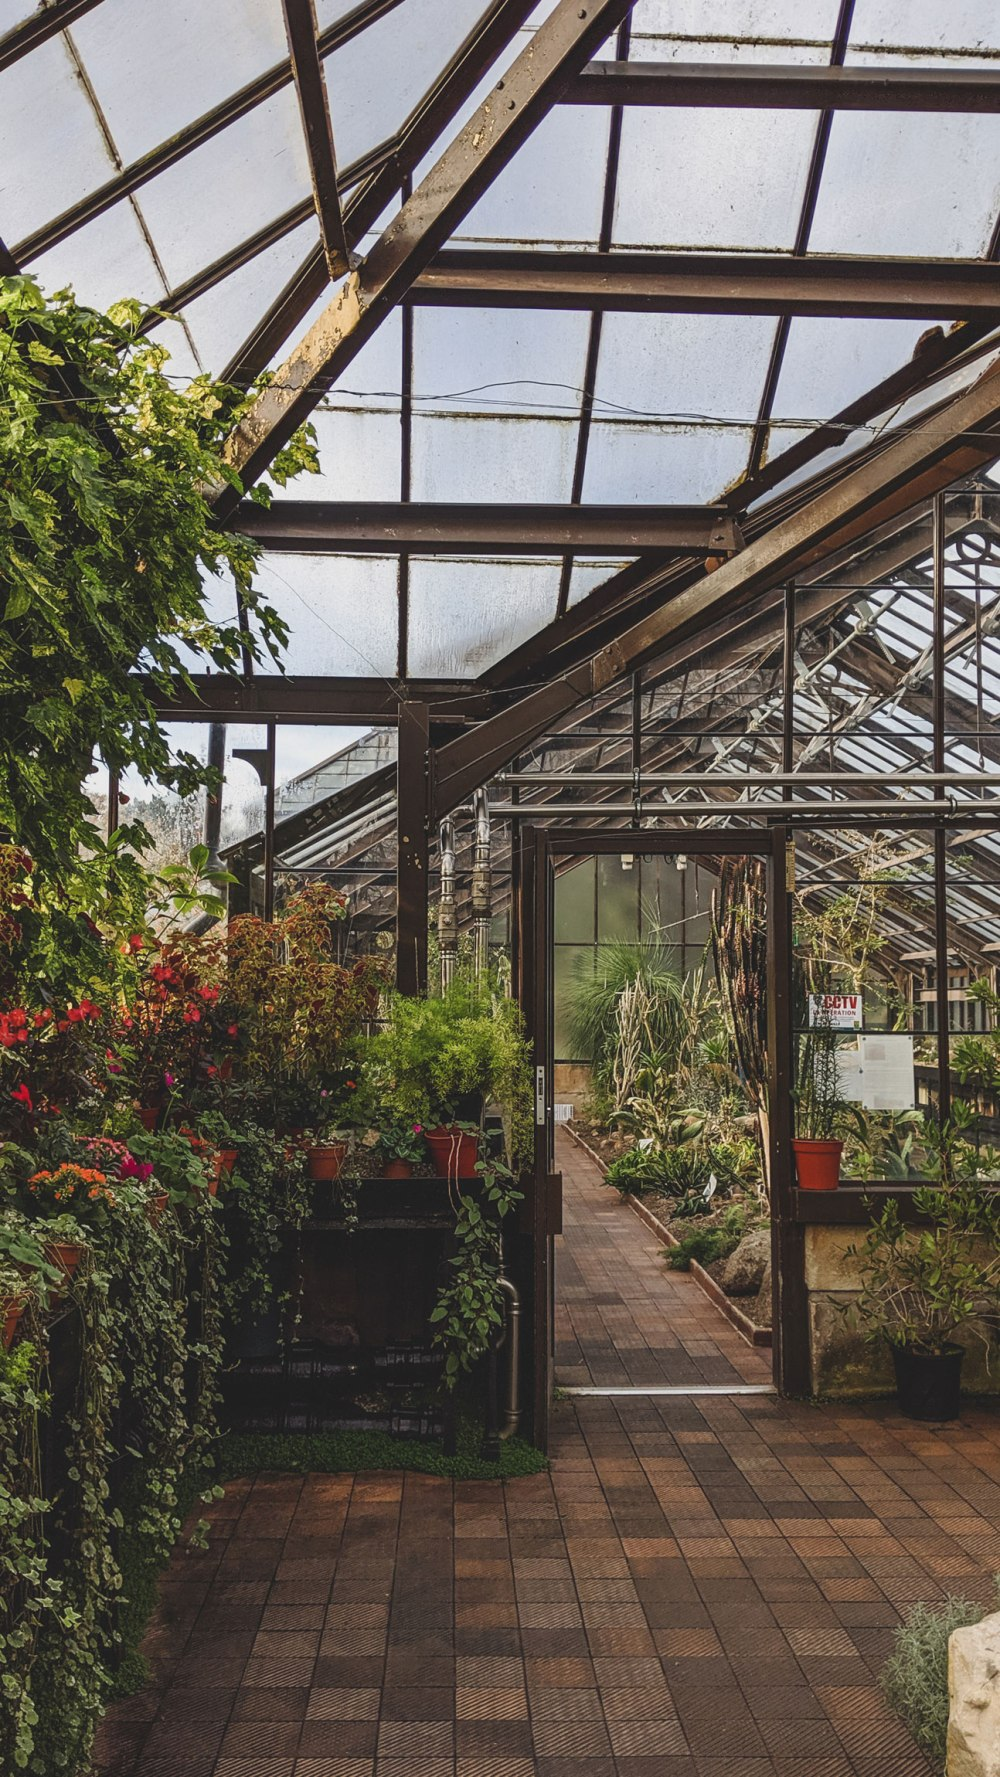 Glasgow-Botanic-Gardens (2)